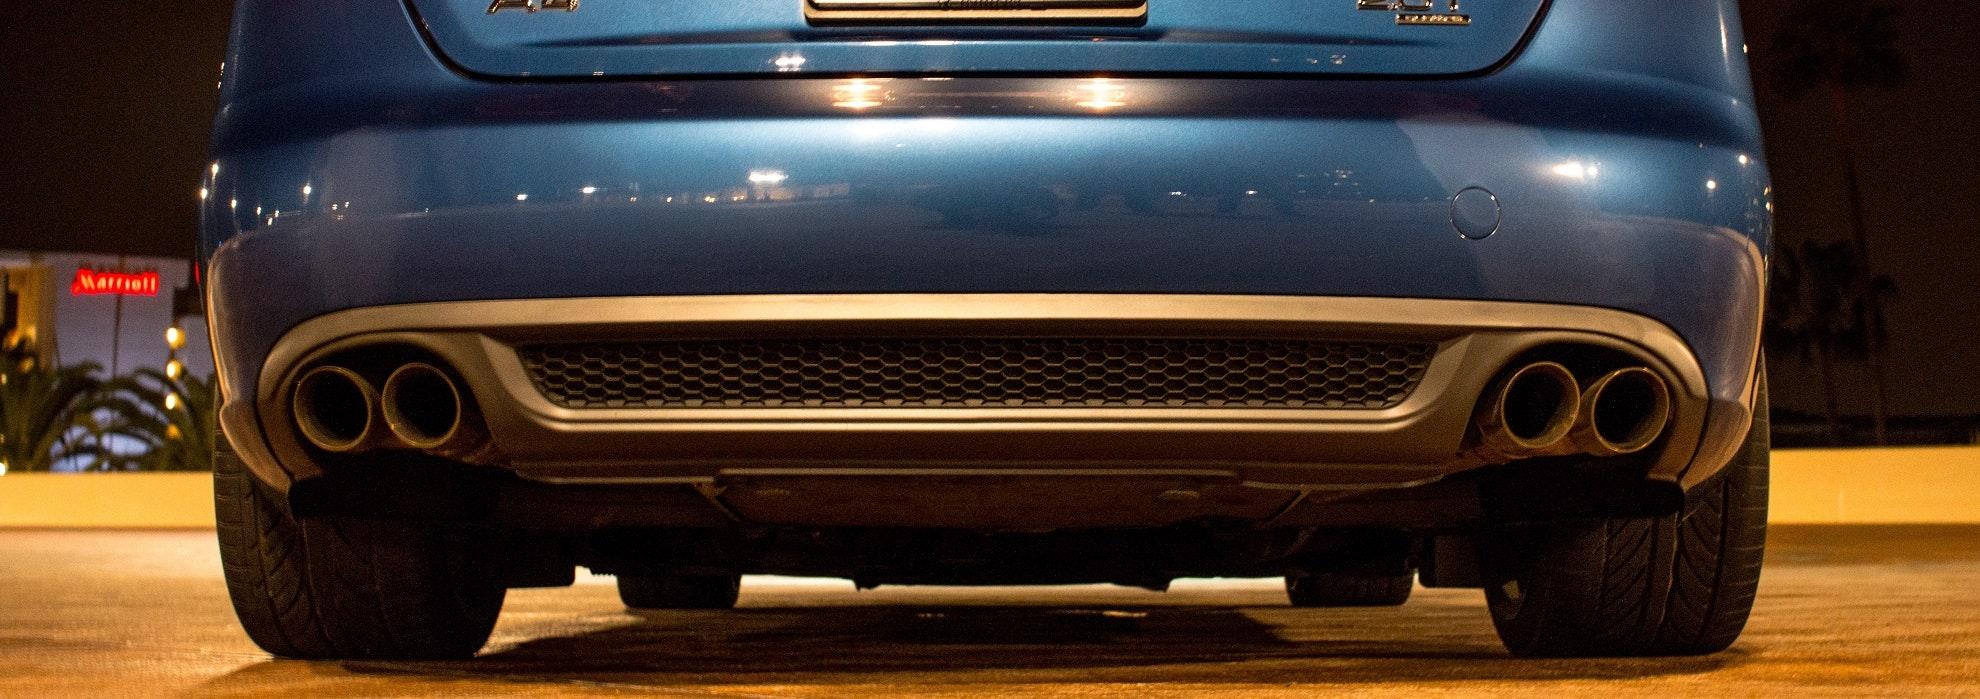 Audi A4 B8 Rear Diffuser